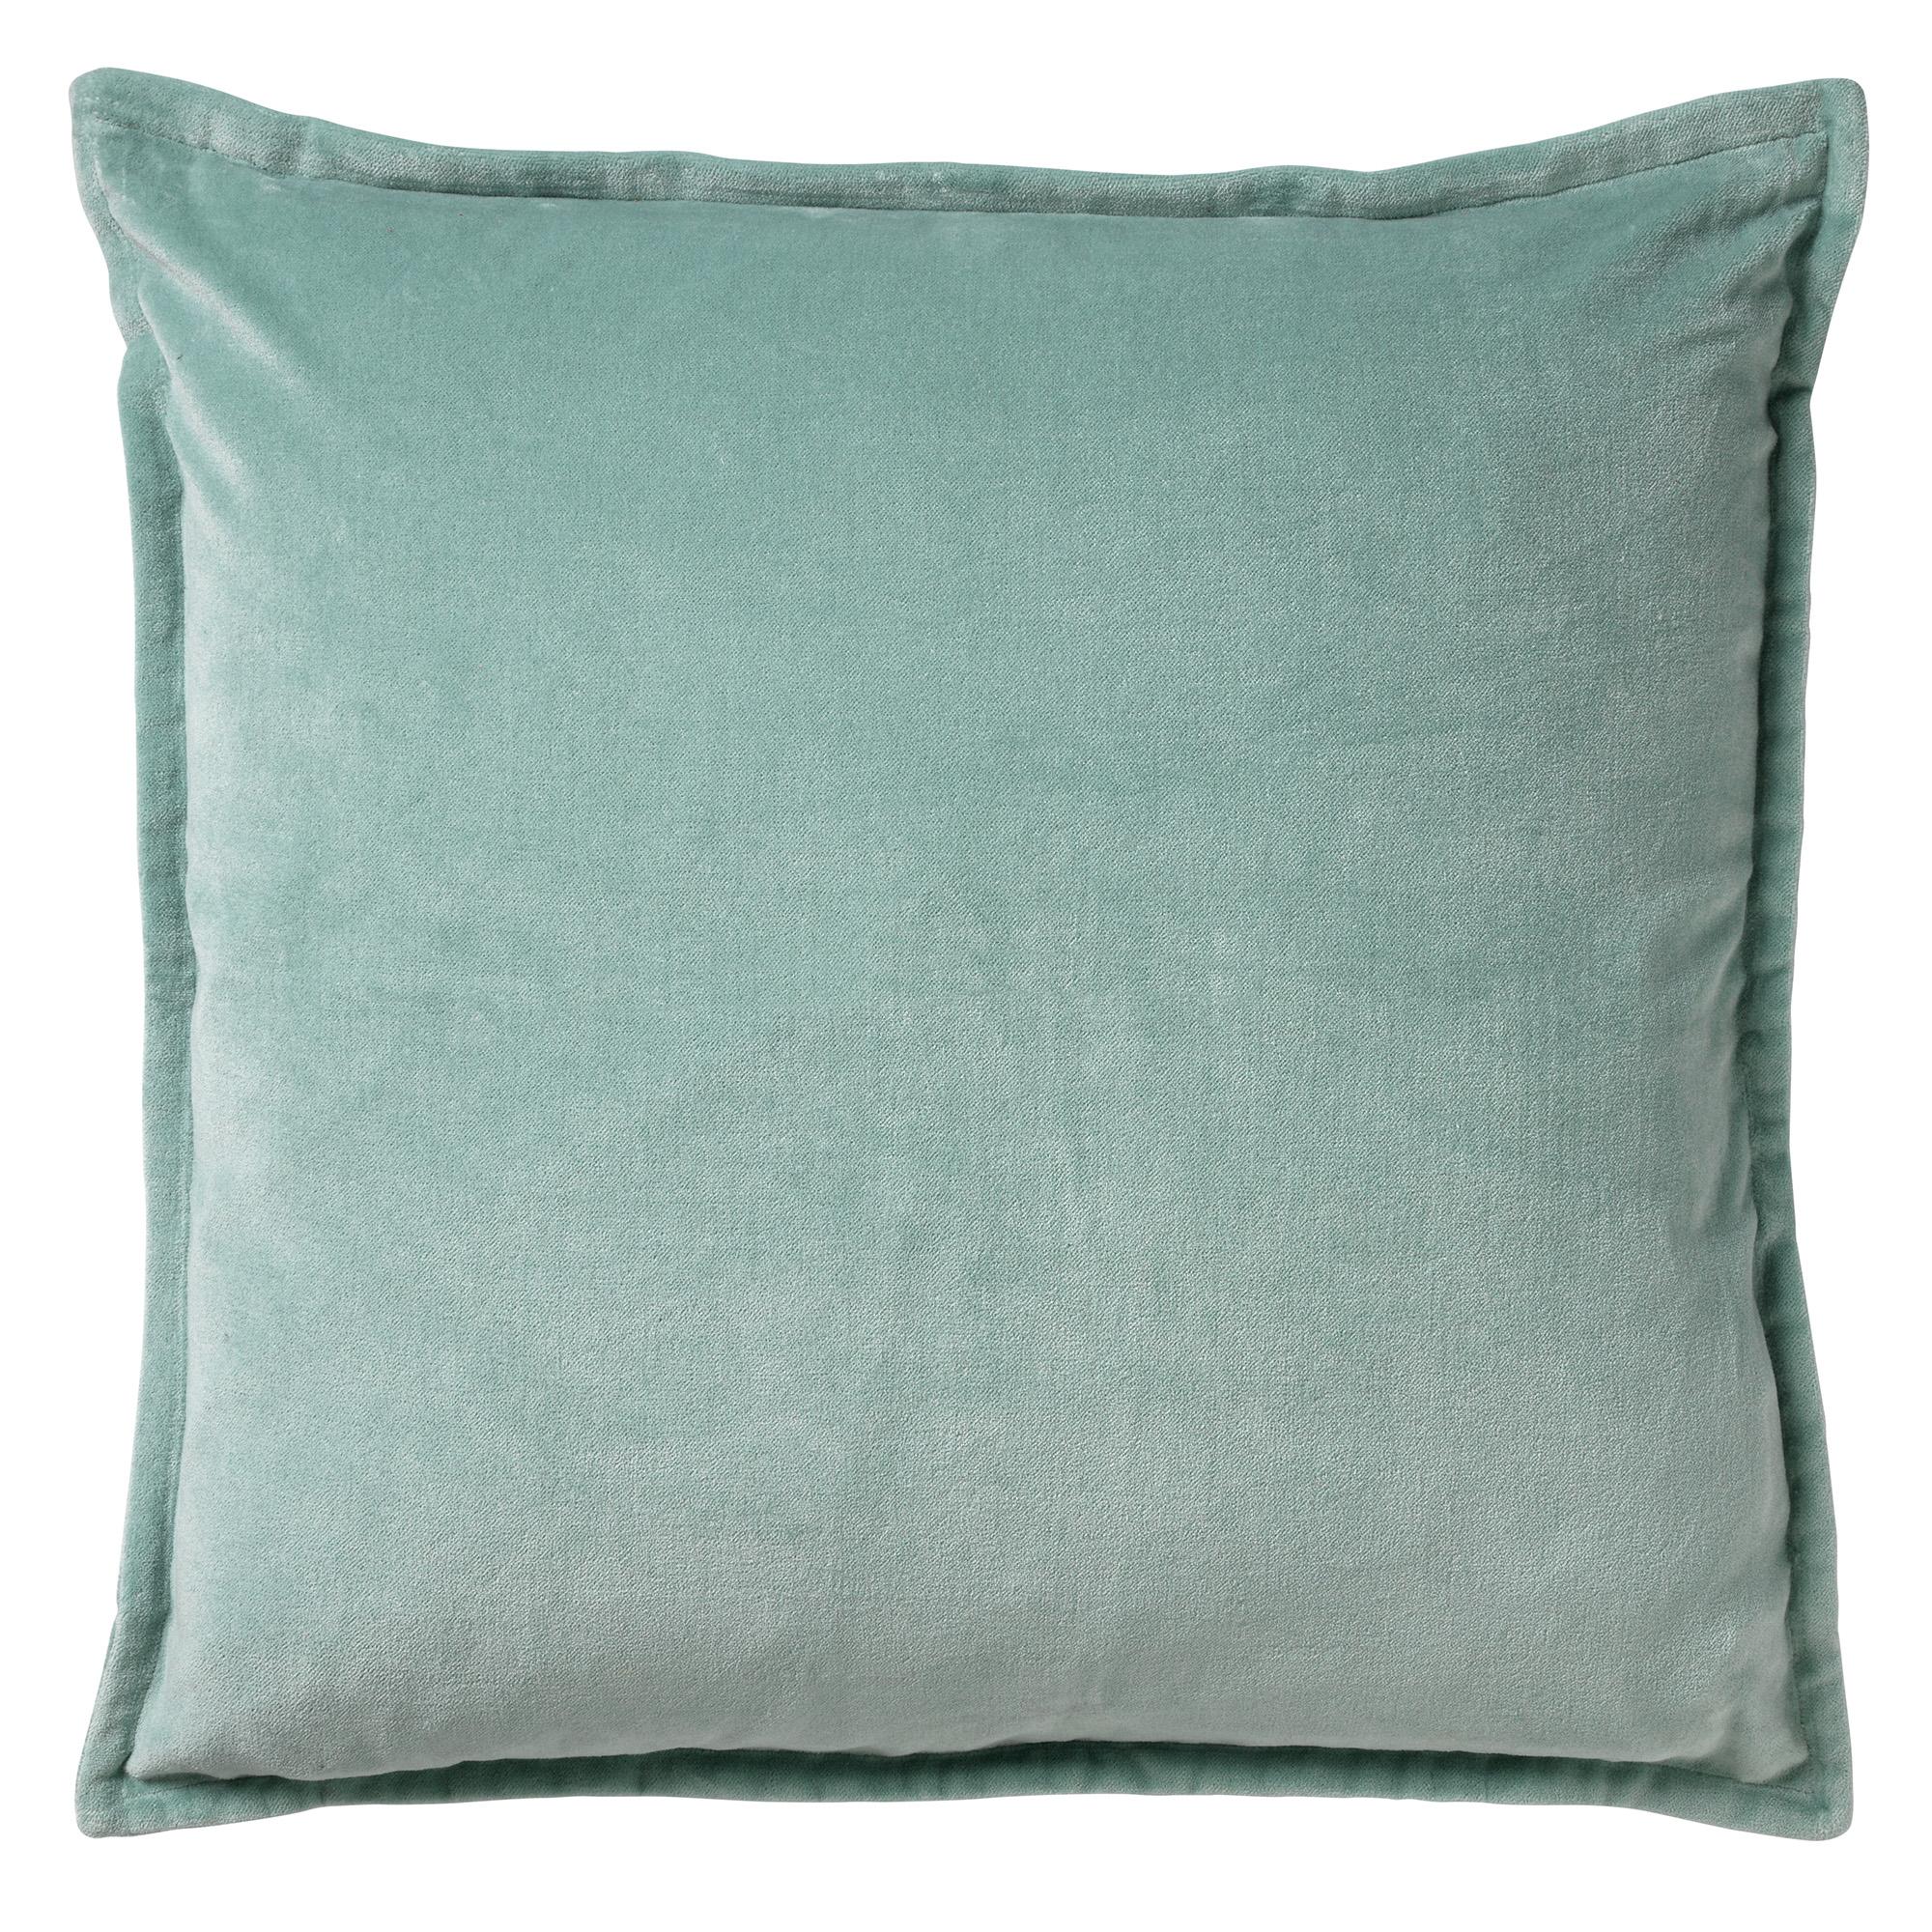 CAITH - Sierkussen velvet Jadeite 50x50 cm